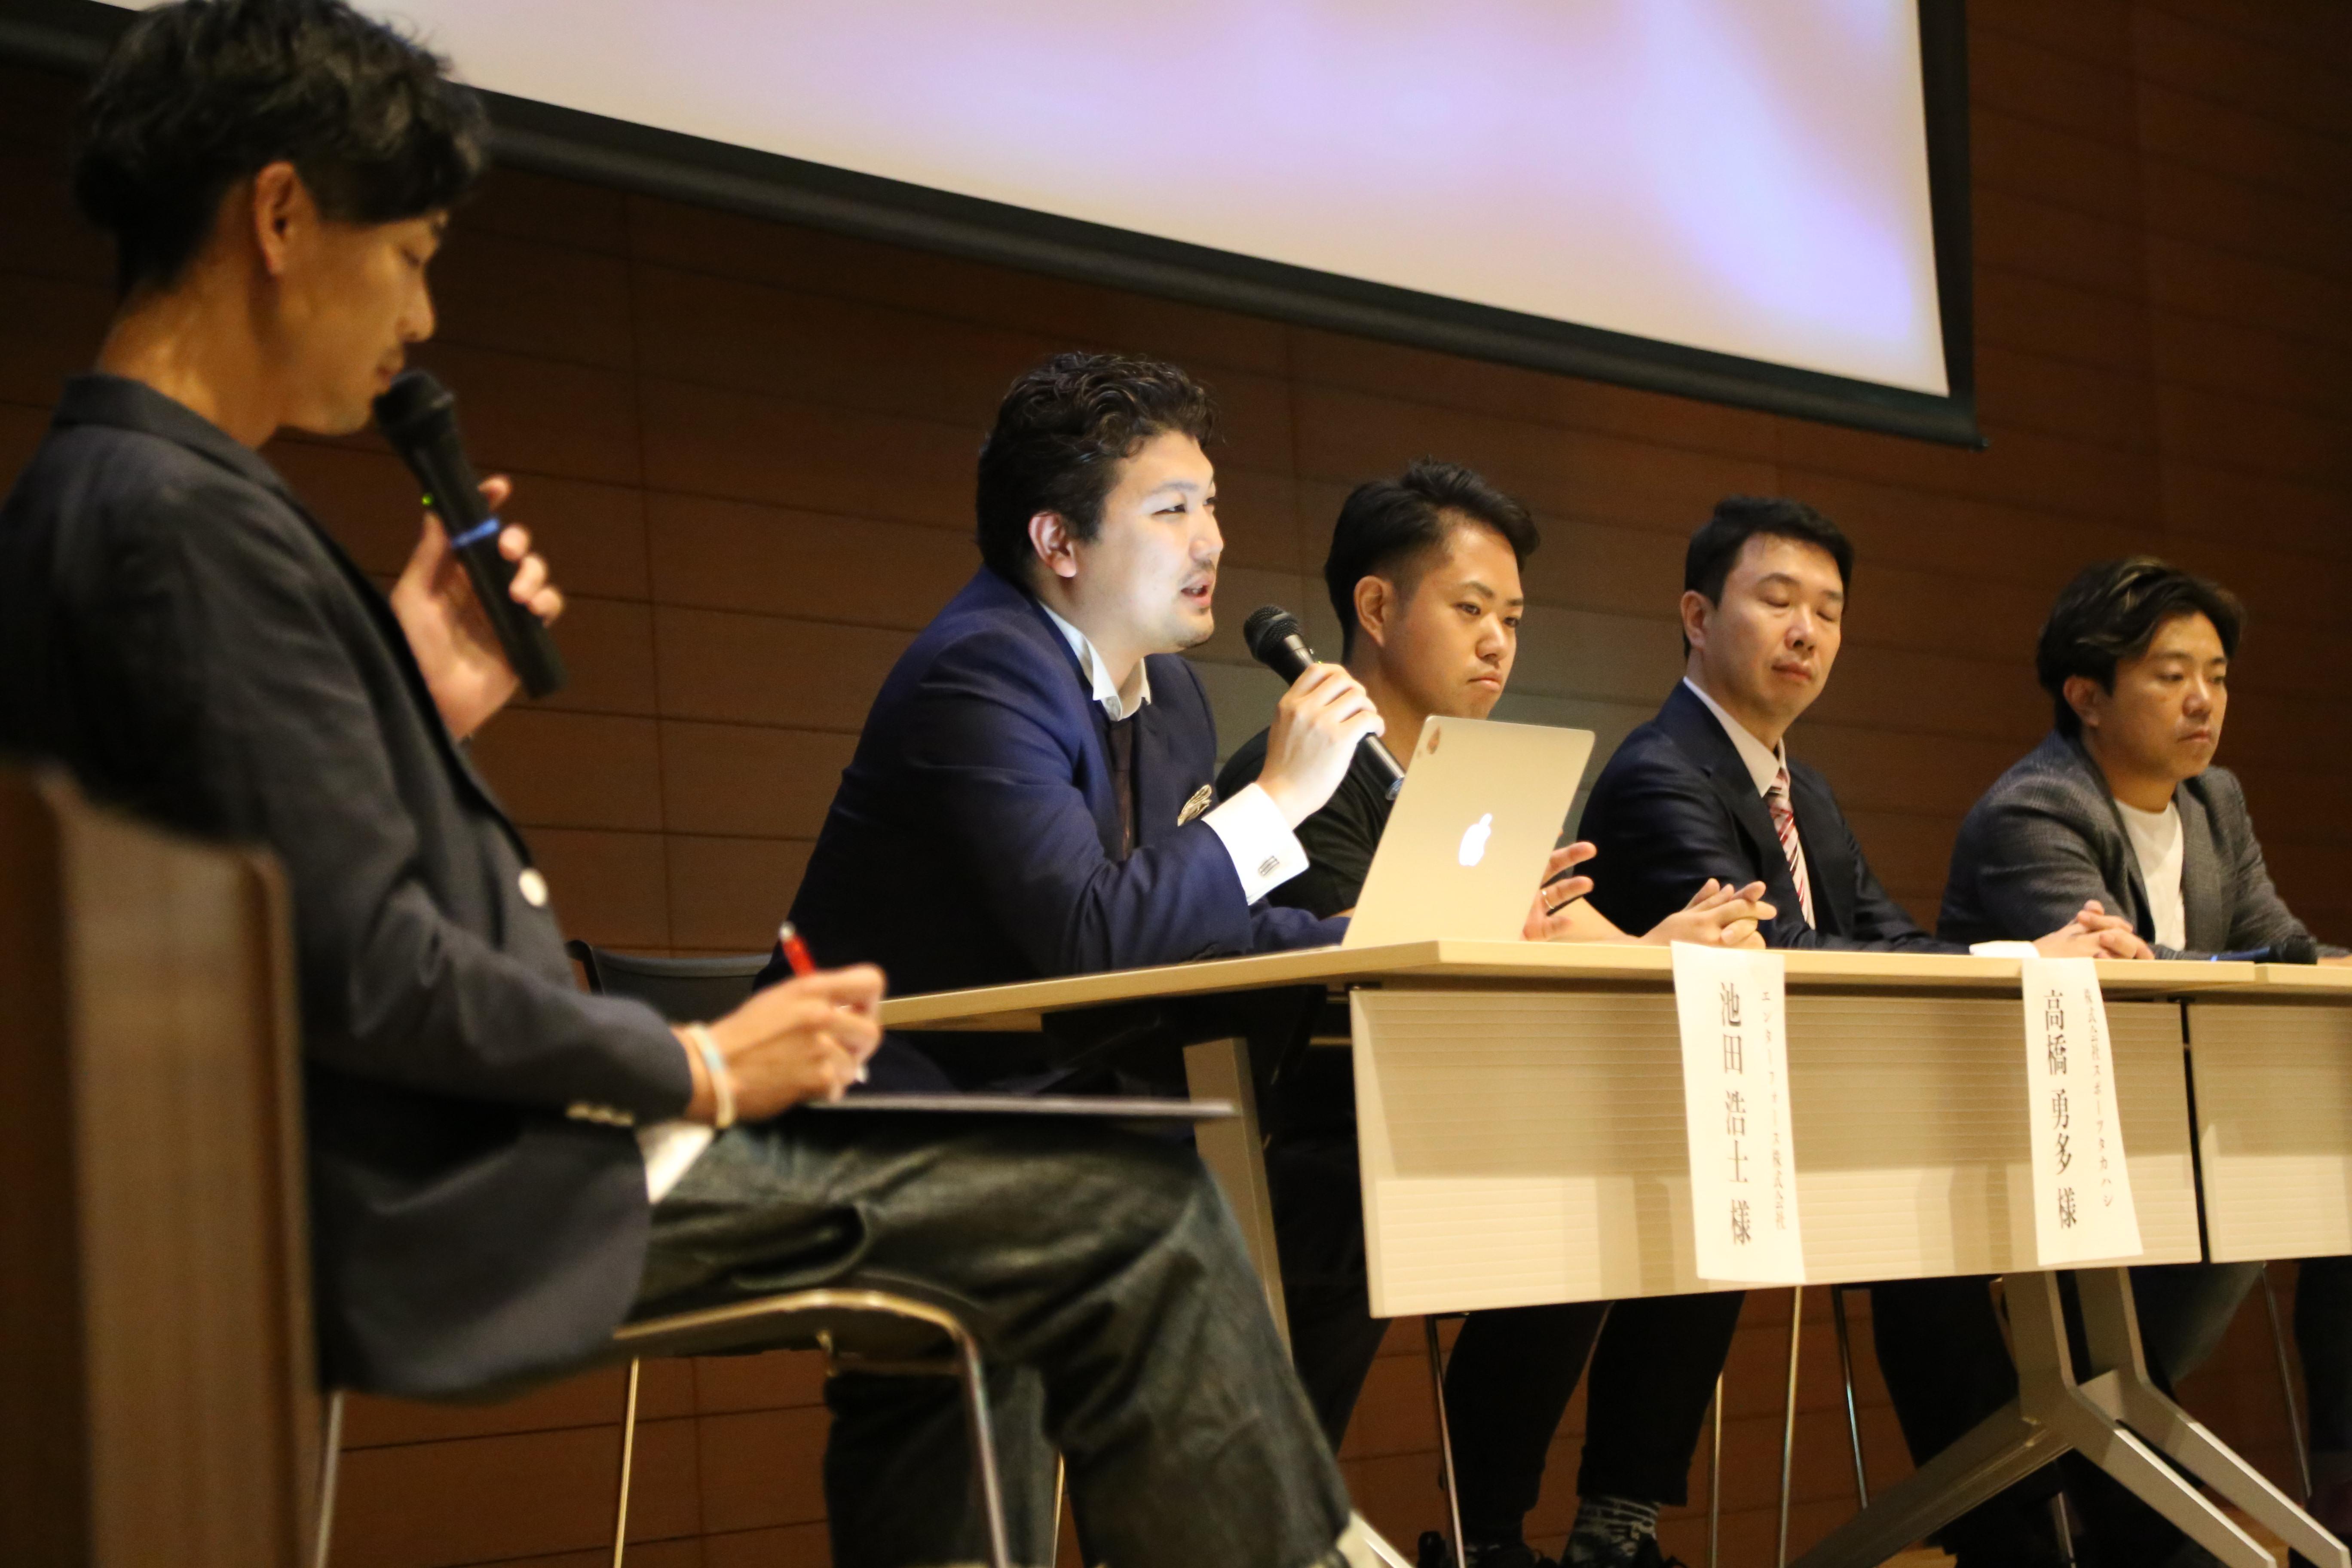 大阪eスポーツ研究会講演